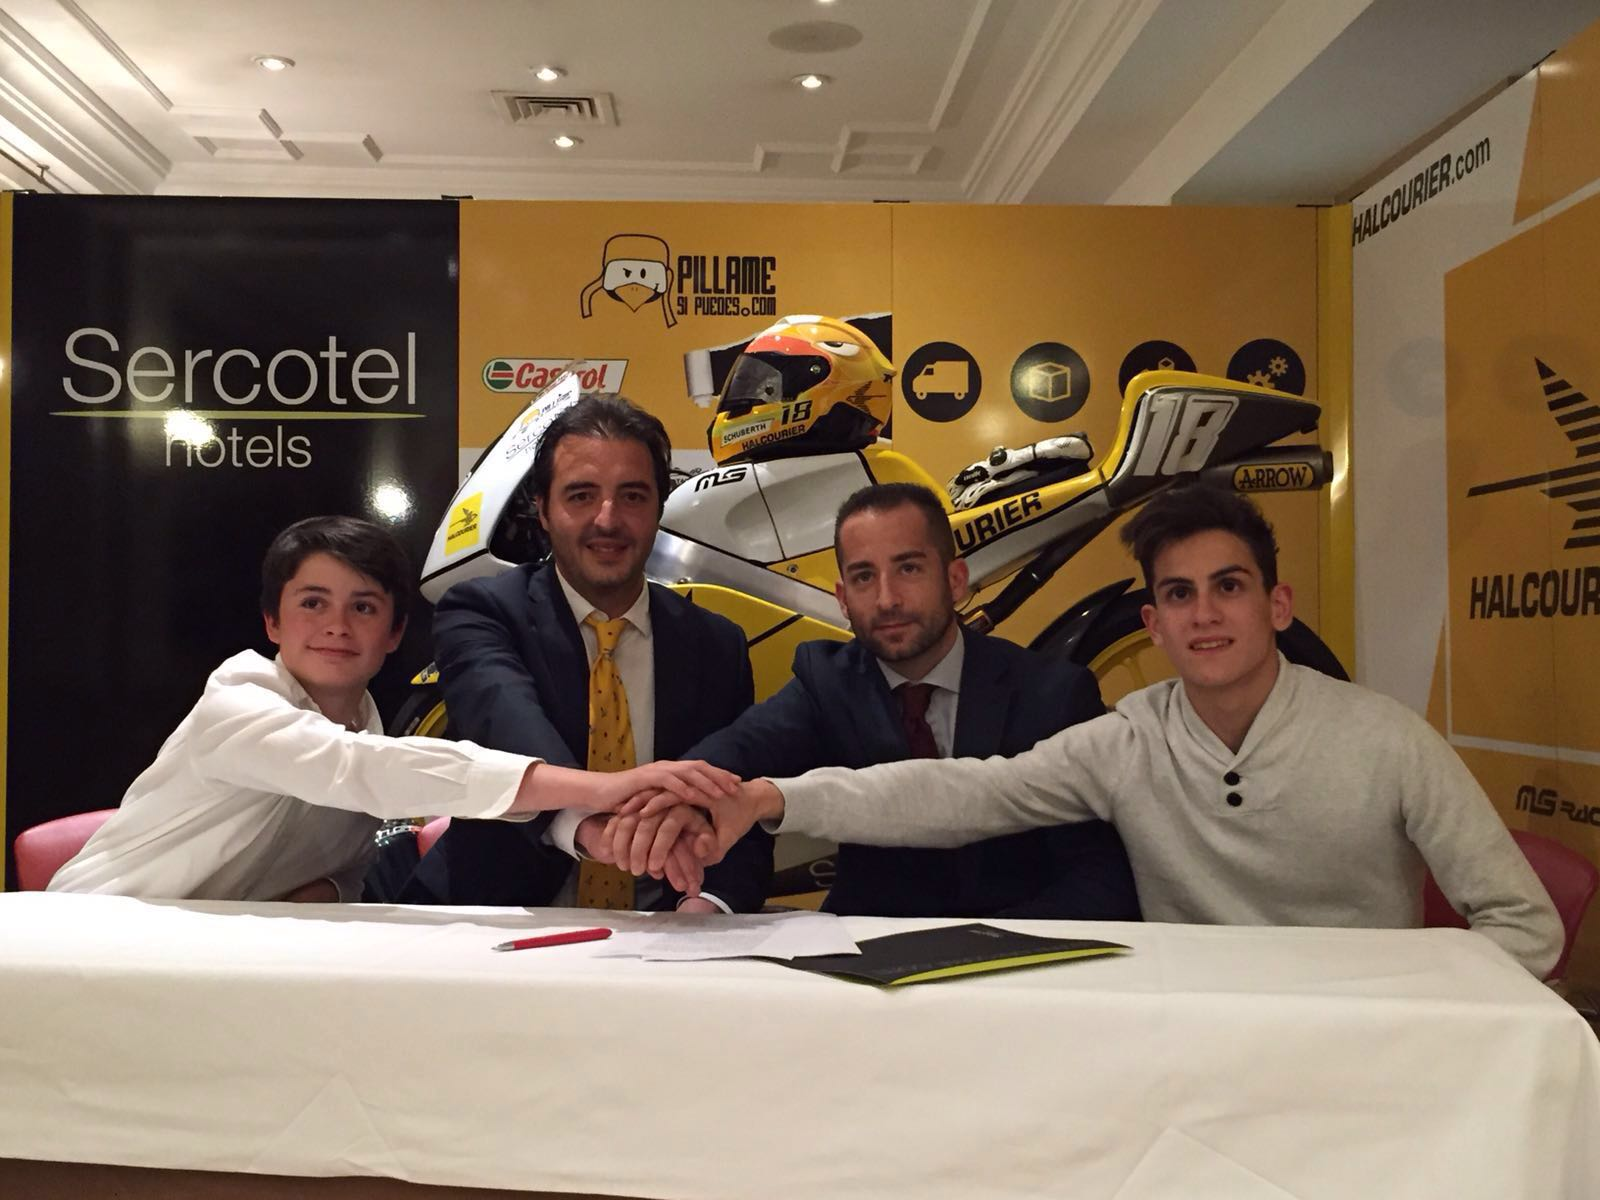 Sercotel-piloto-Moto3